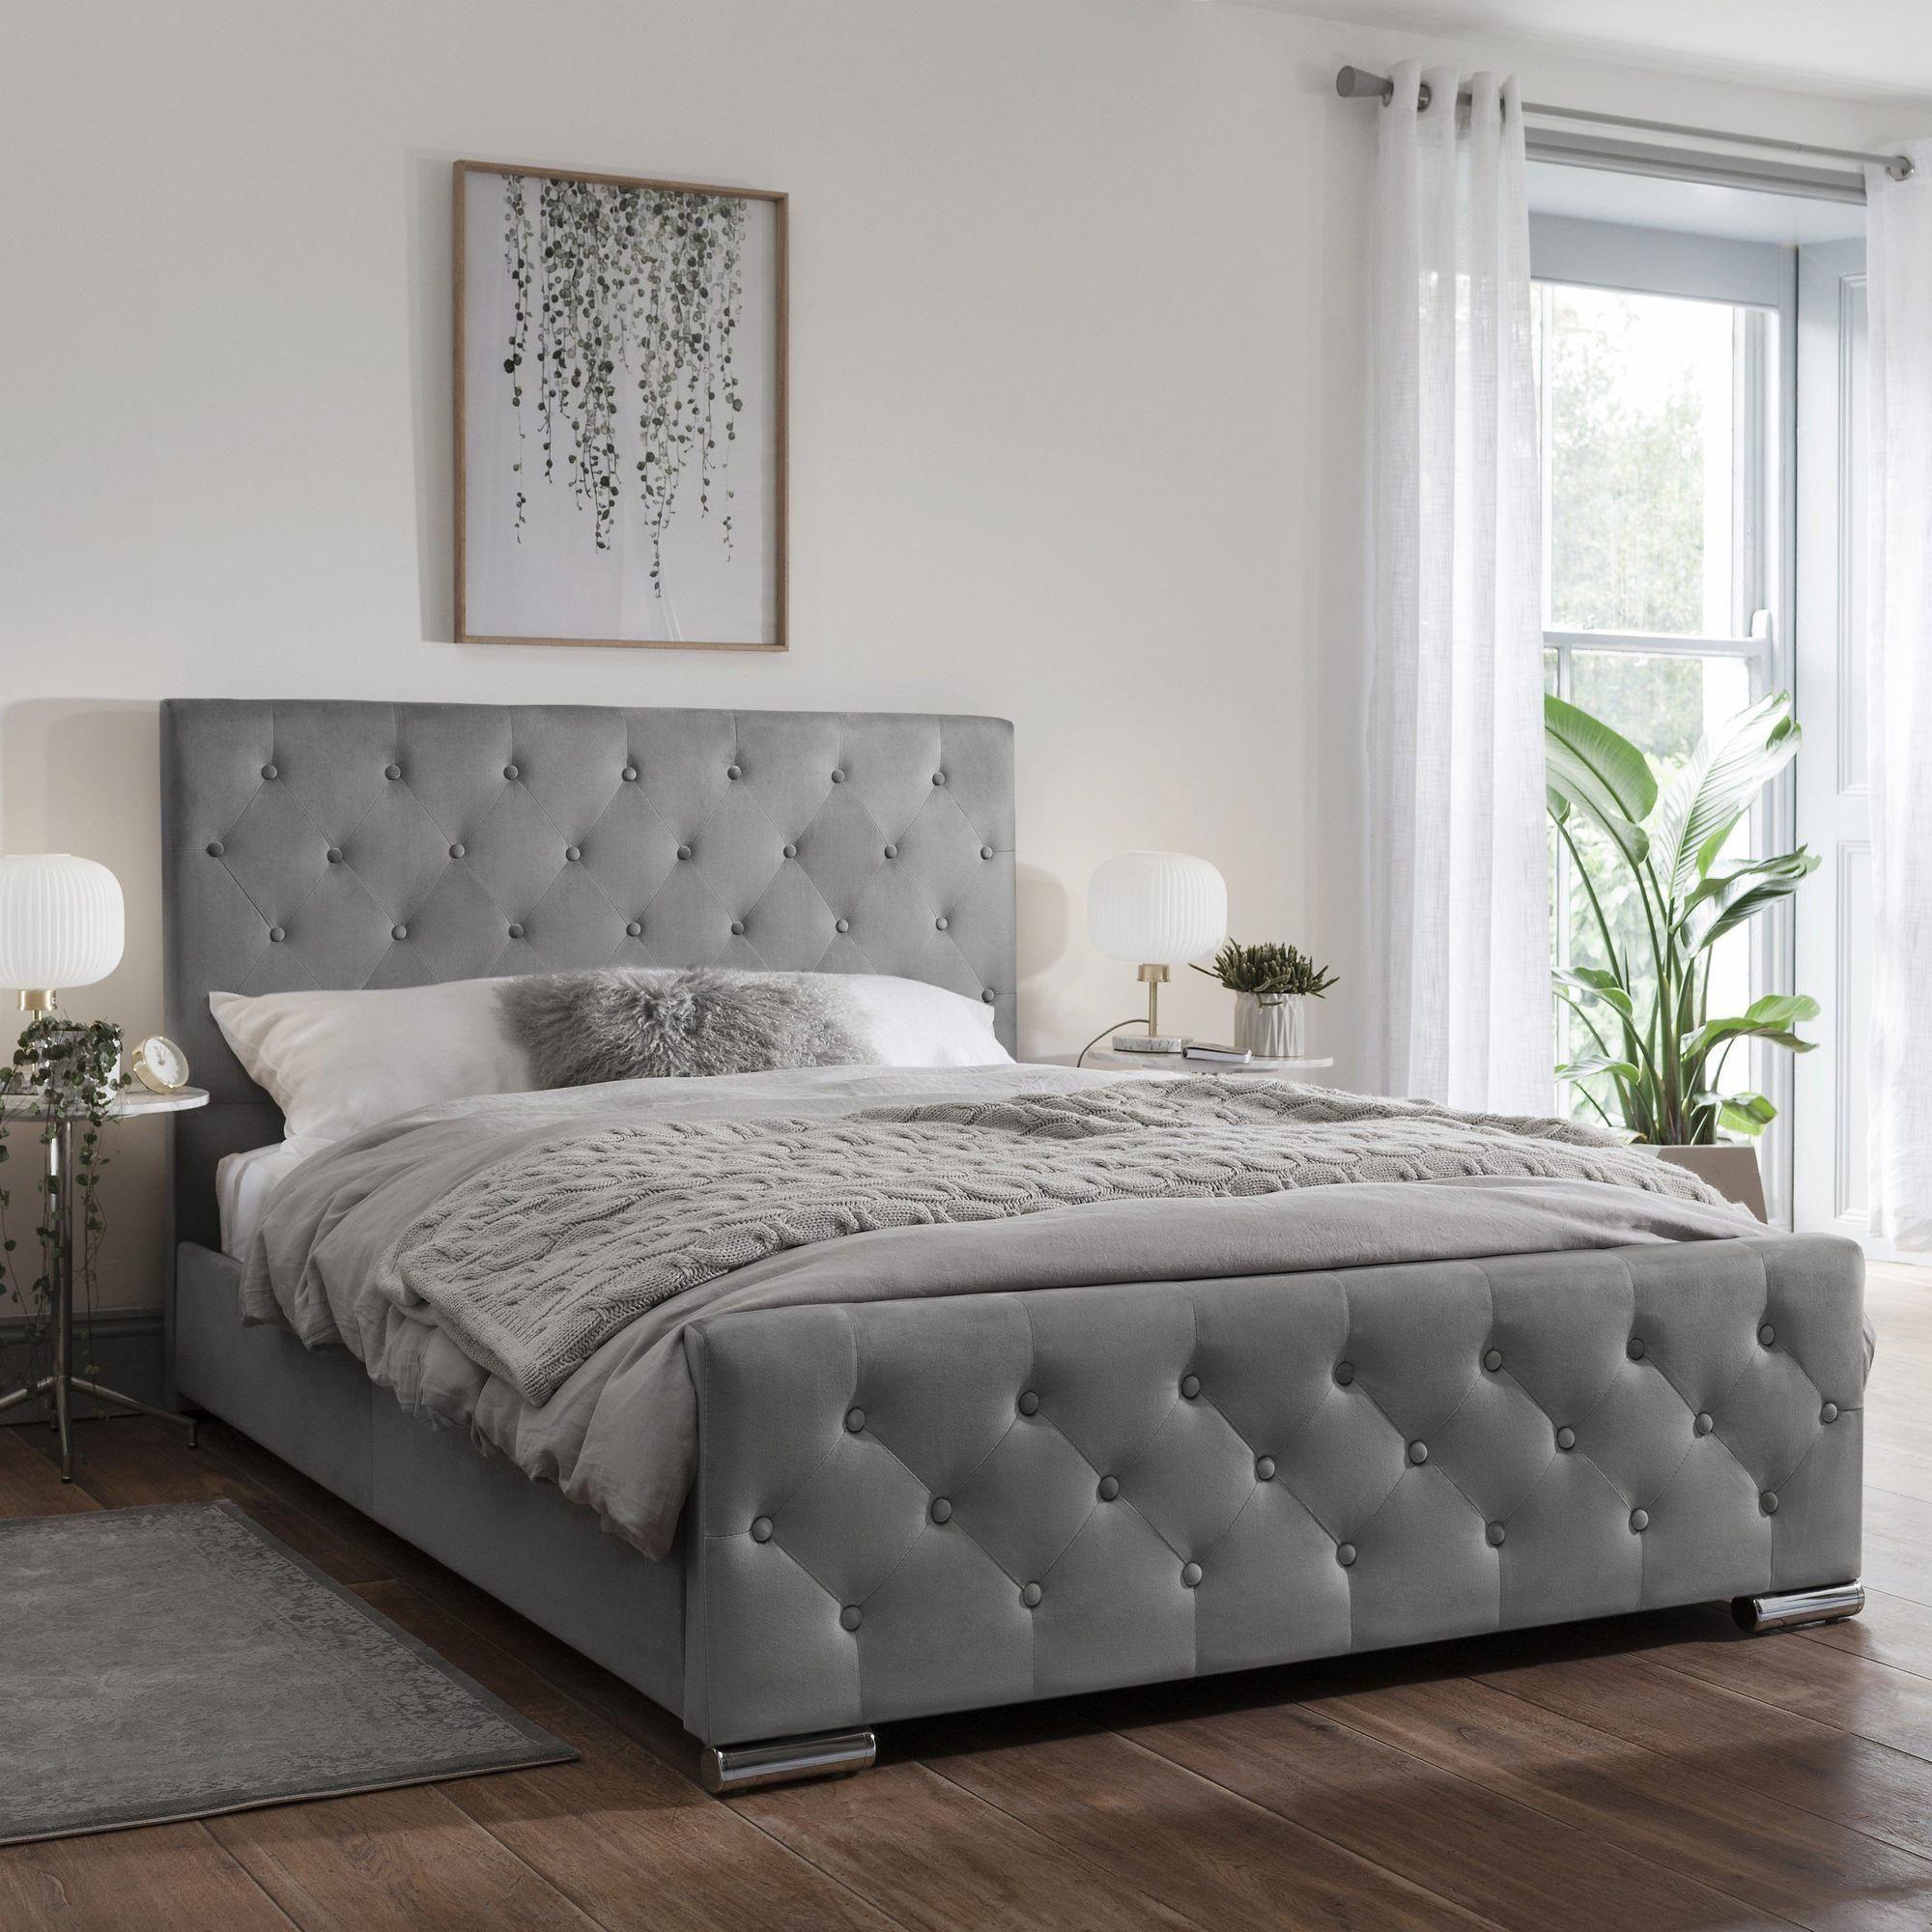 Bed Frames Queen Size White Furnitureanak Bedframes In 2020